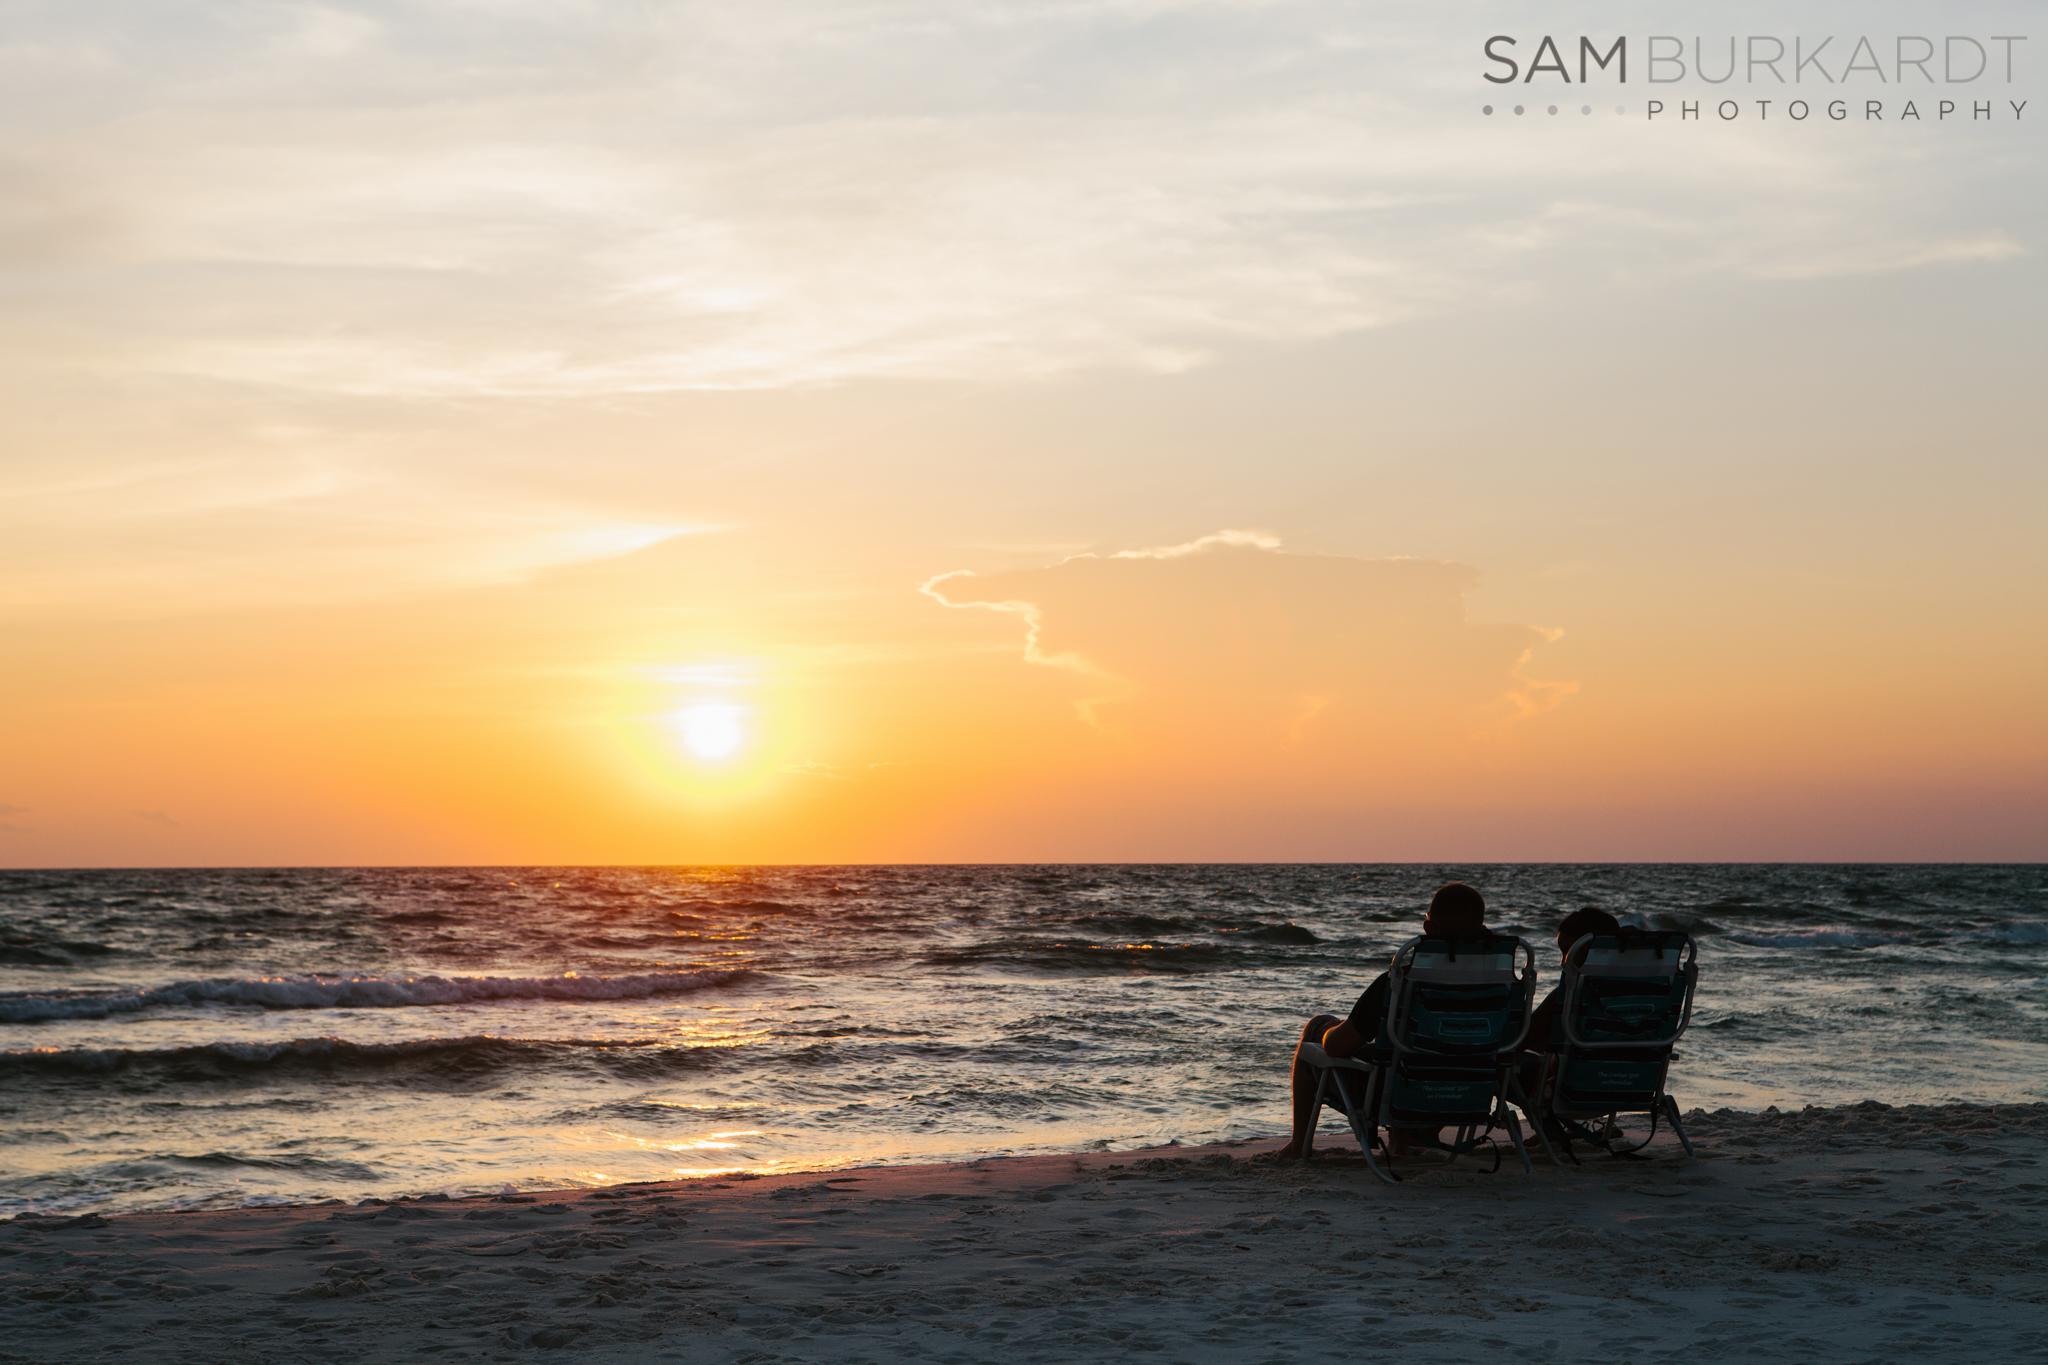 samburkardt_engagement_vacation_beach_cape_san_blas_florida_camping_gopro_0032.jpg